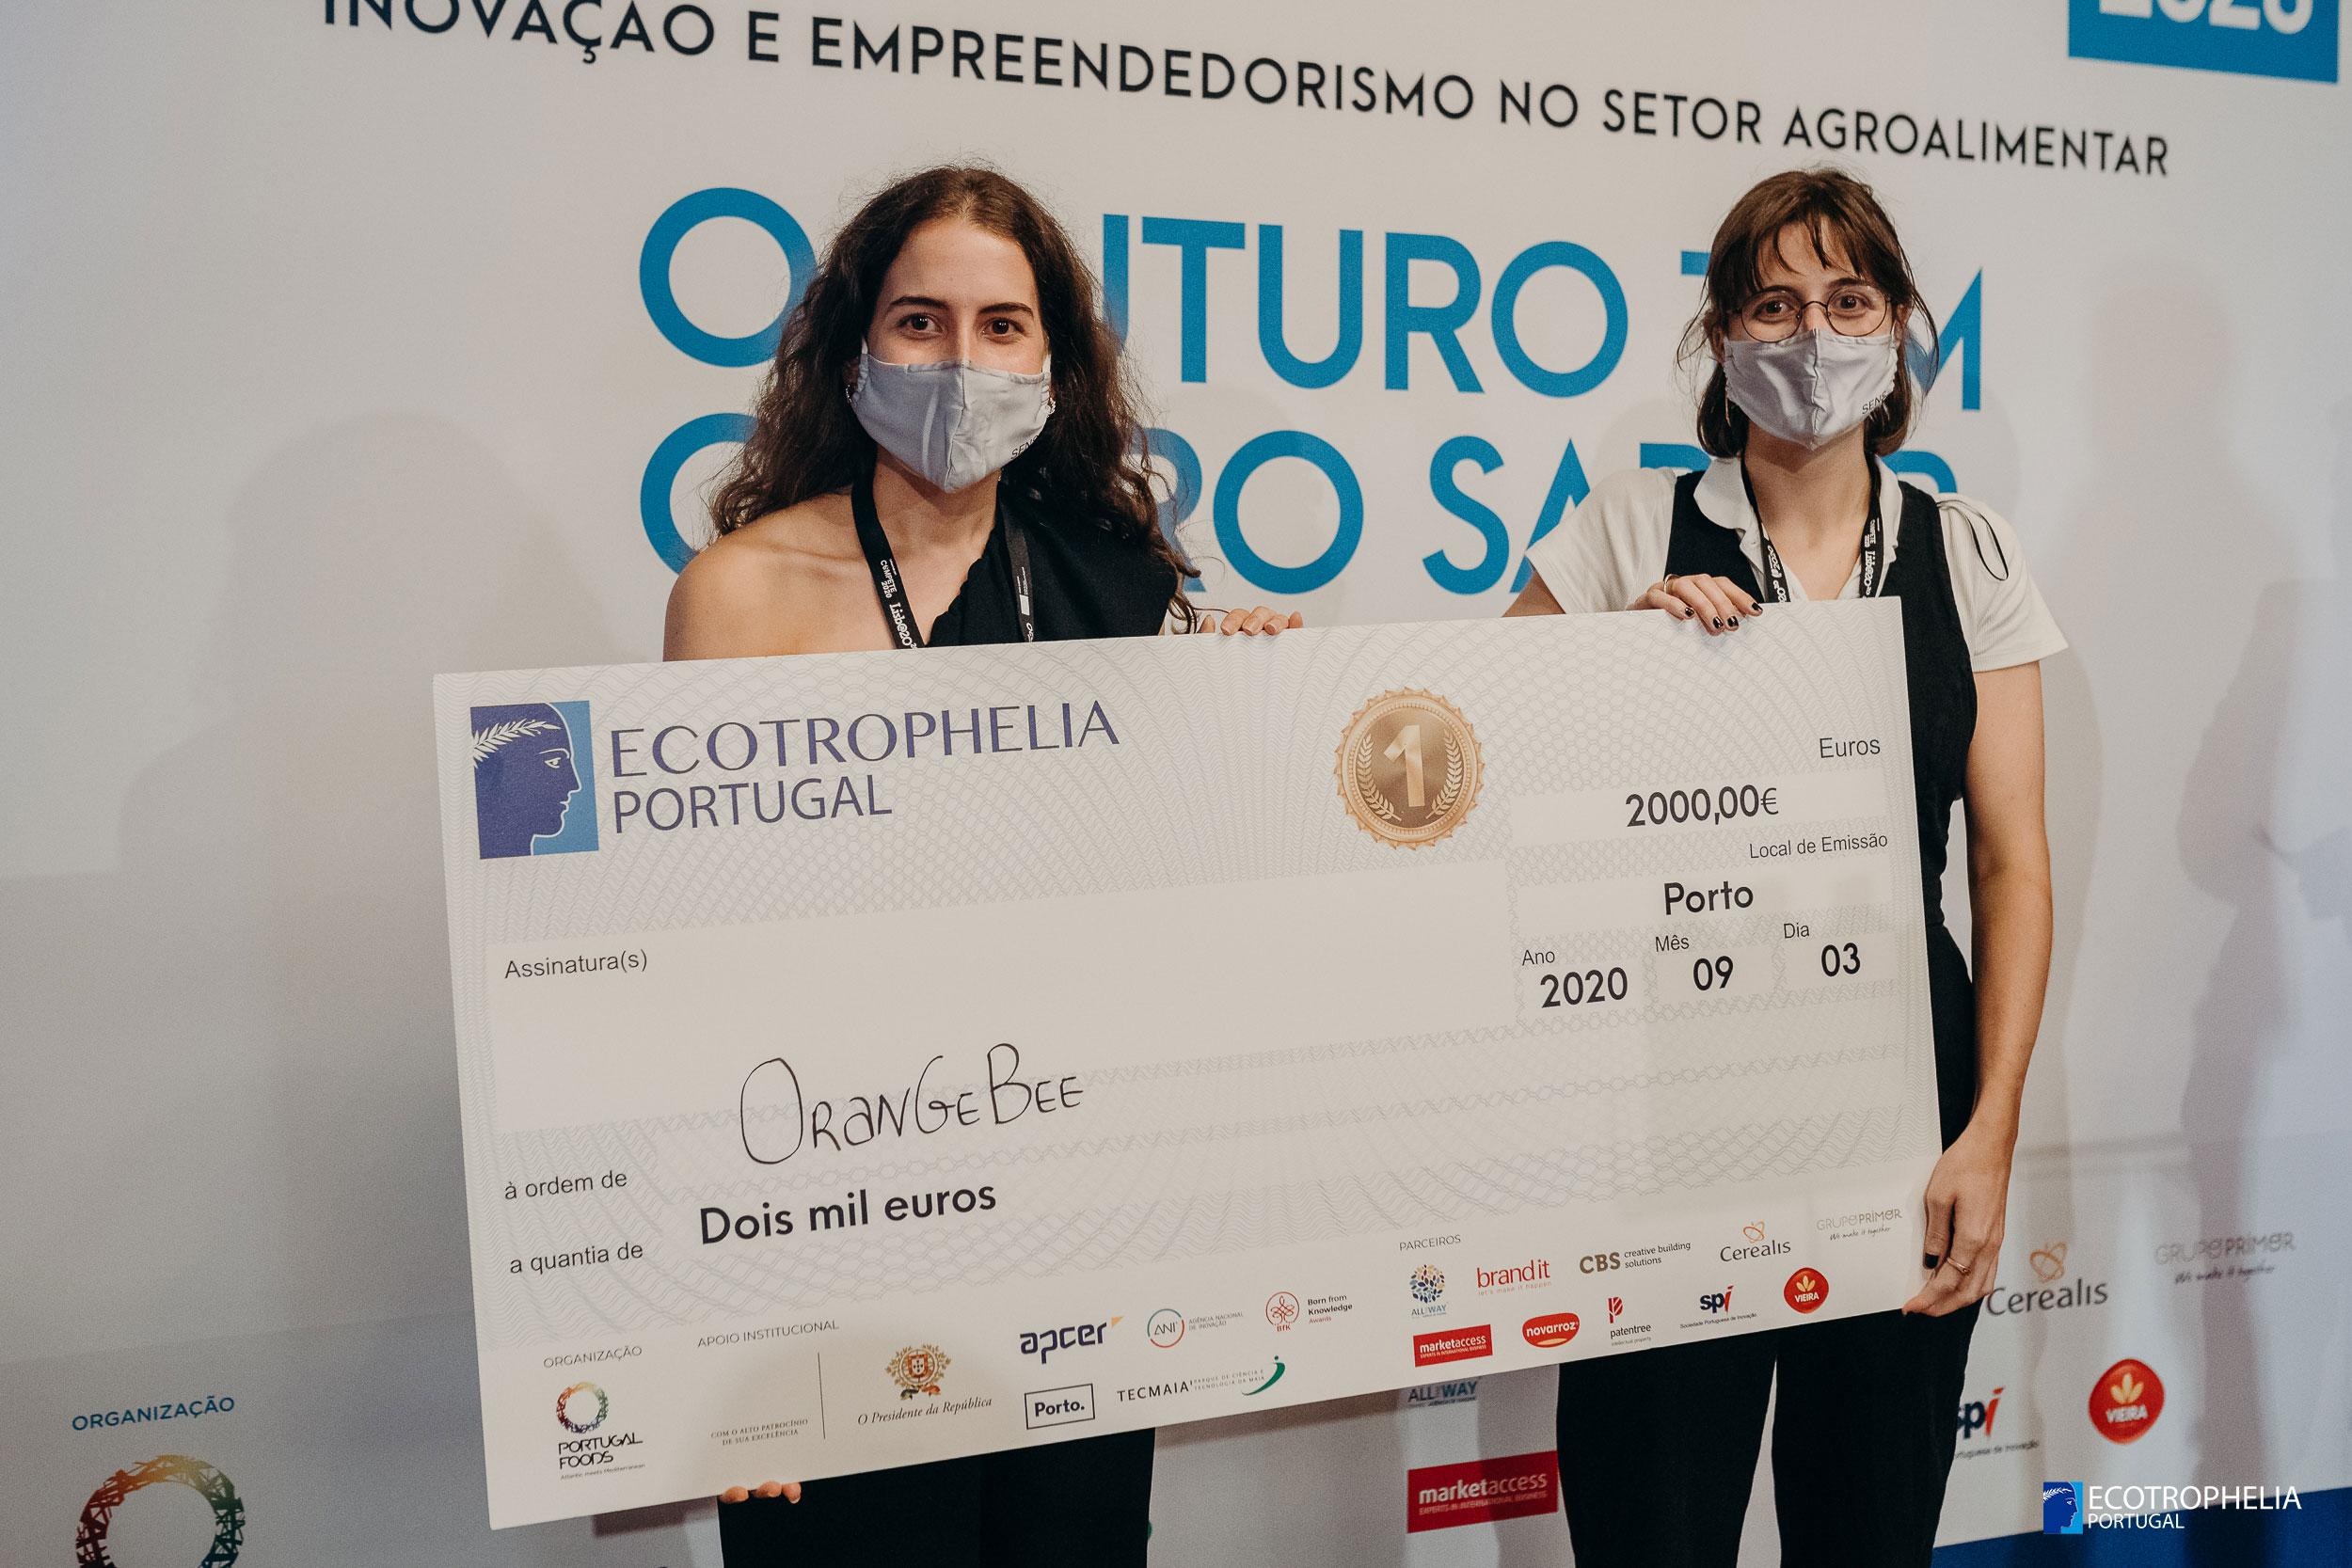 OrangeBee - Equipa vencedora ECOTROPHELIA Portugal 2020